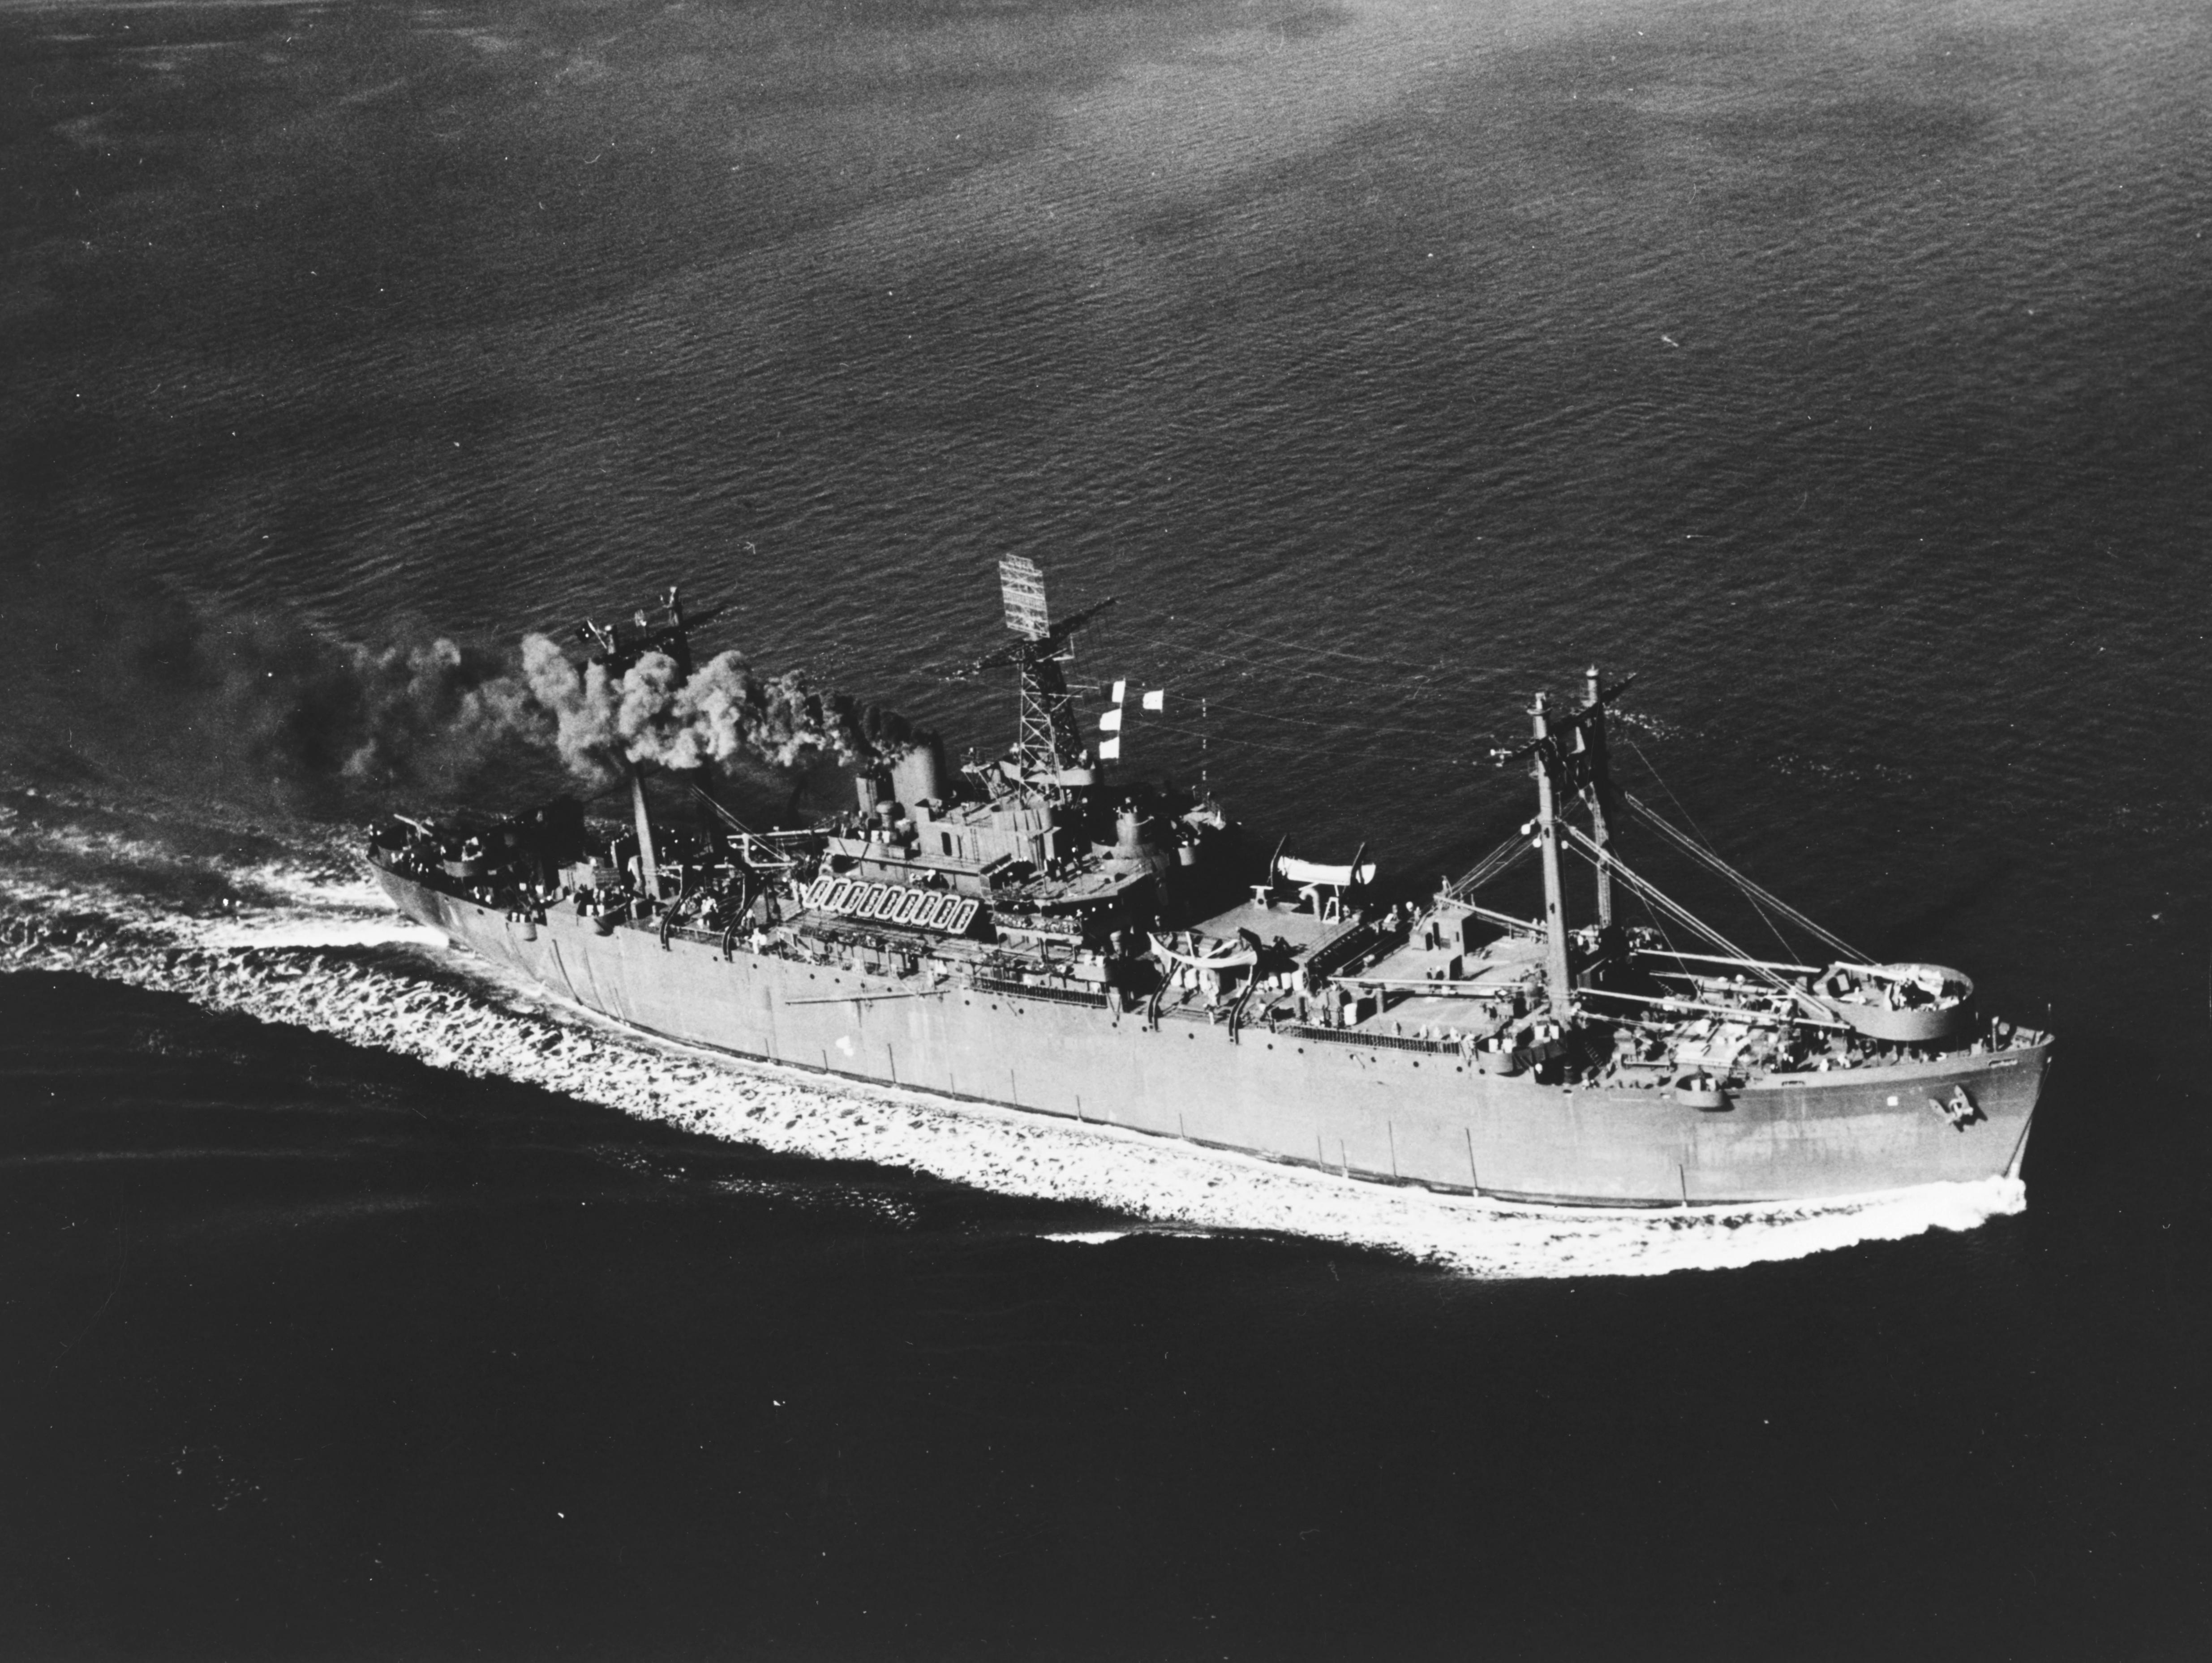 USS_Blue_Ridge_%28AGC-2%29_underway_in_1943.jpg